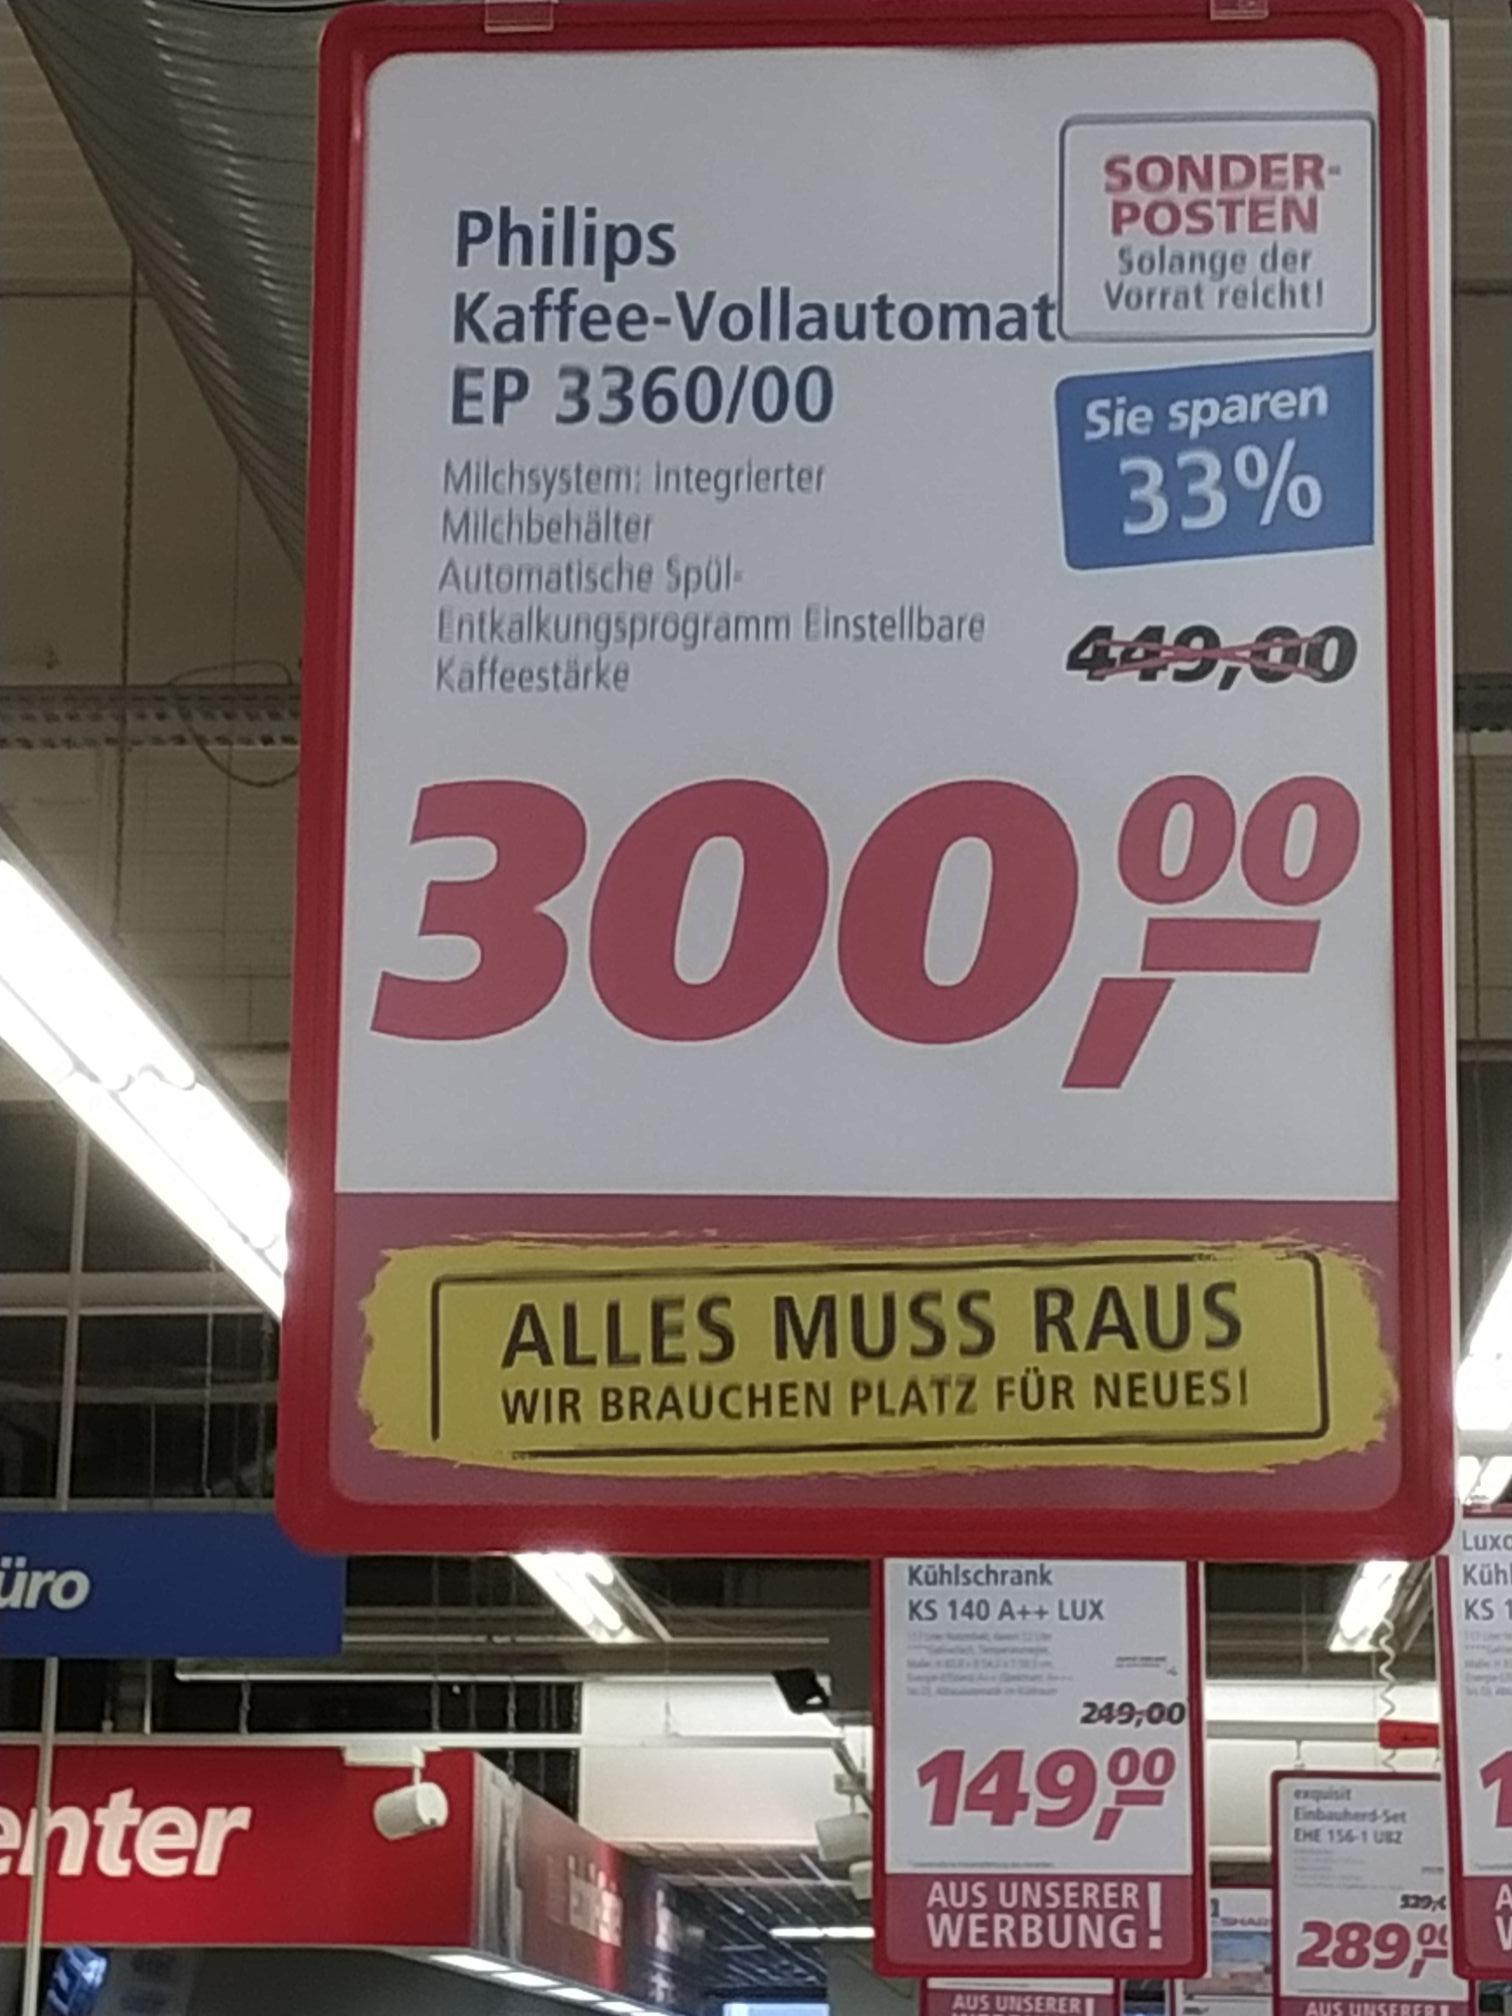 Philips EP3360 Kaffeevollautomat Real Alzey